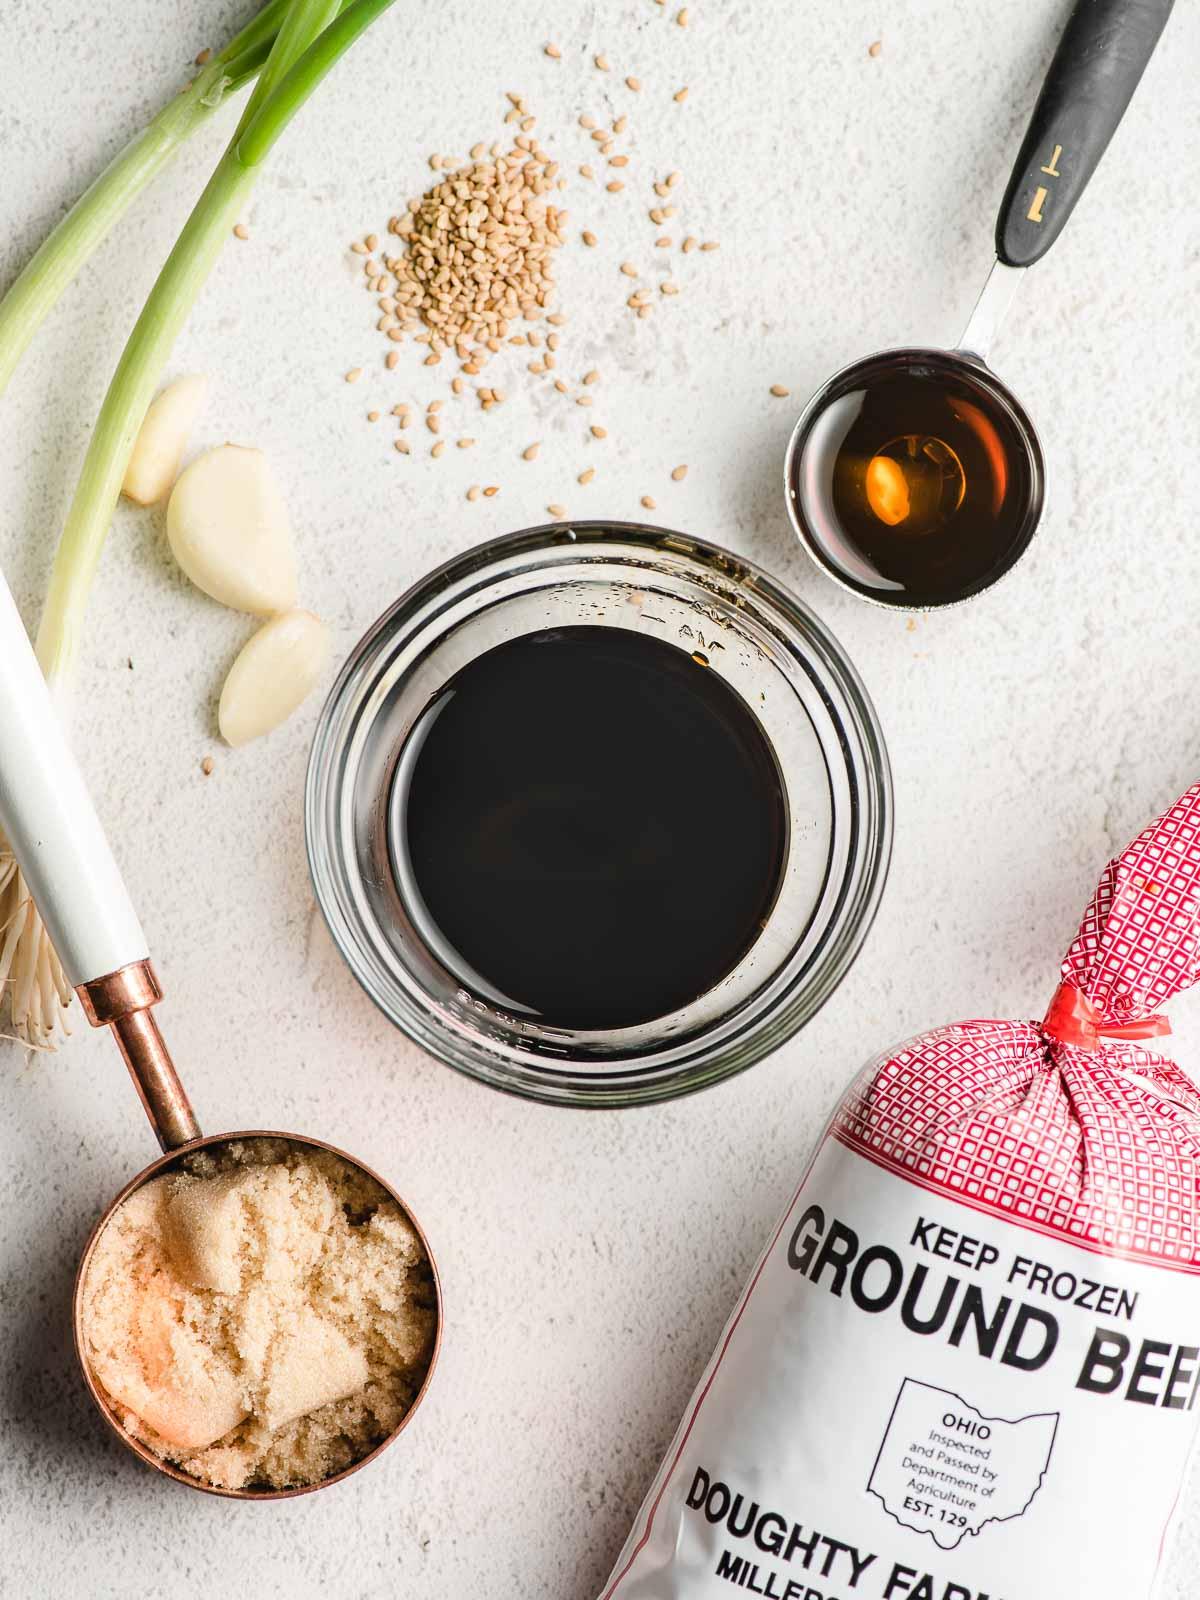 Ingredients in Korean bulgogi on a white background-brown sugar, green onions, sesame seeds, sesame oil, garlic, and ground beef.